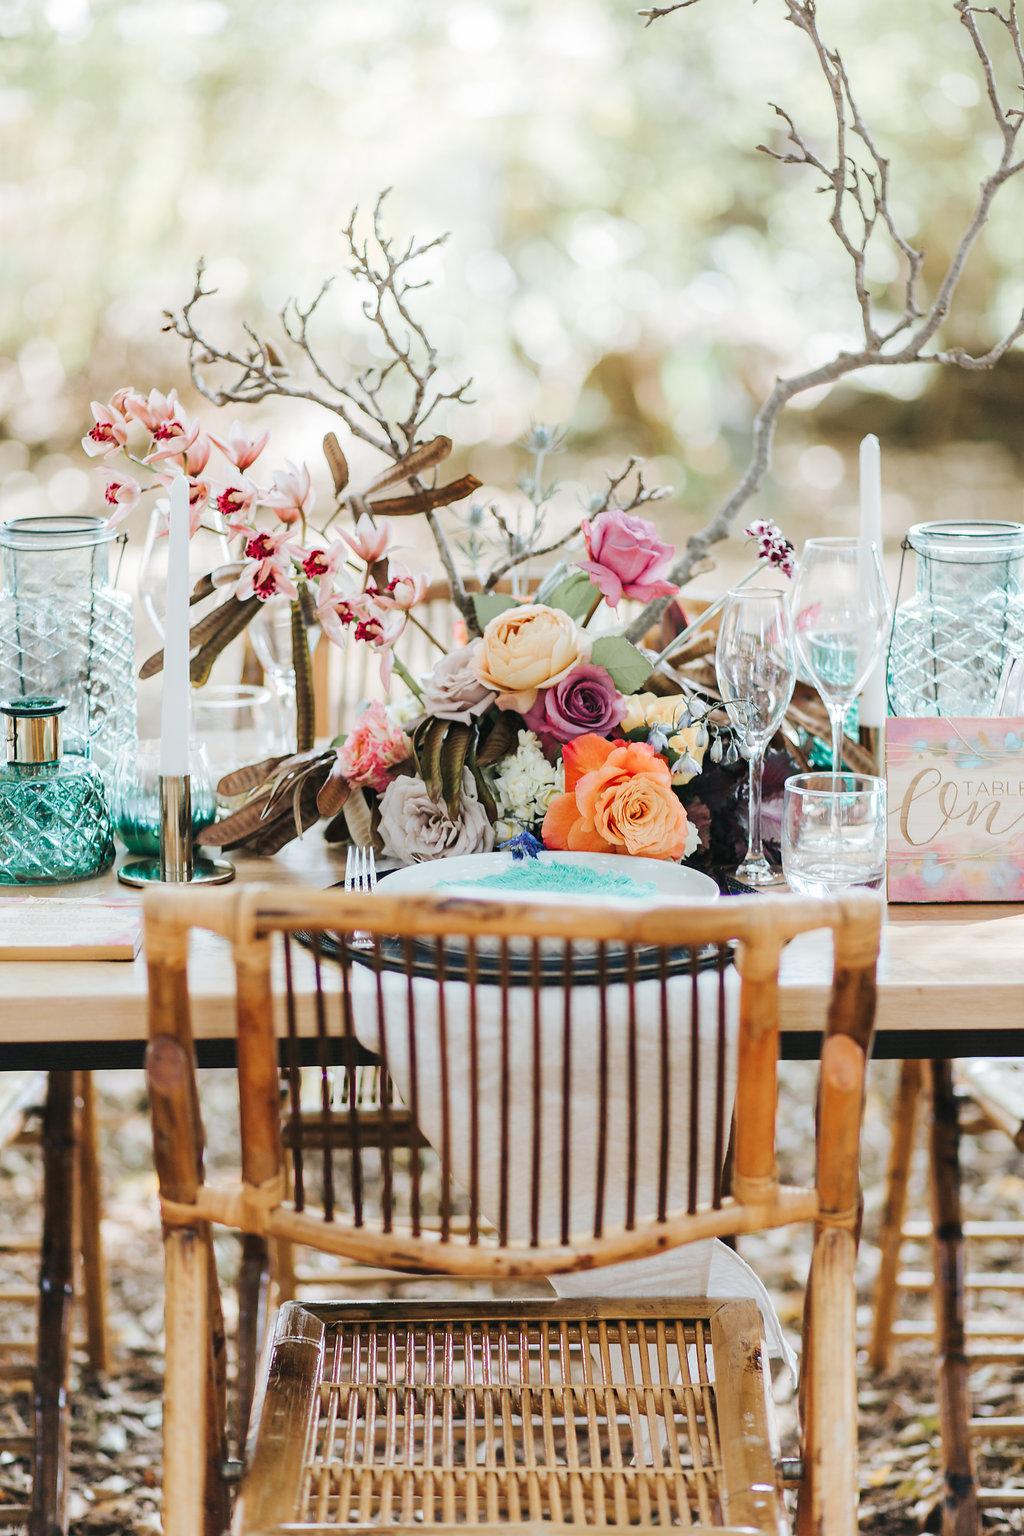 Bloodwood Botanica   Bohemian bright wedding table setting